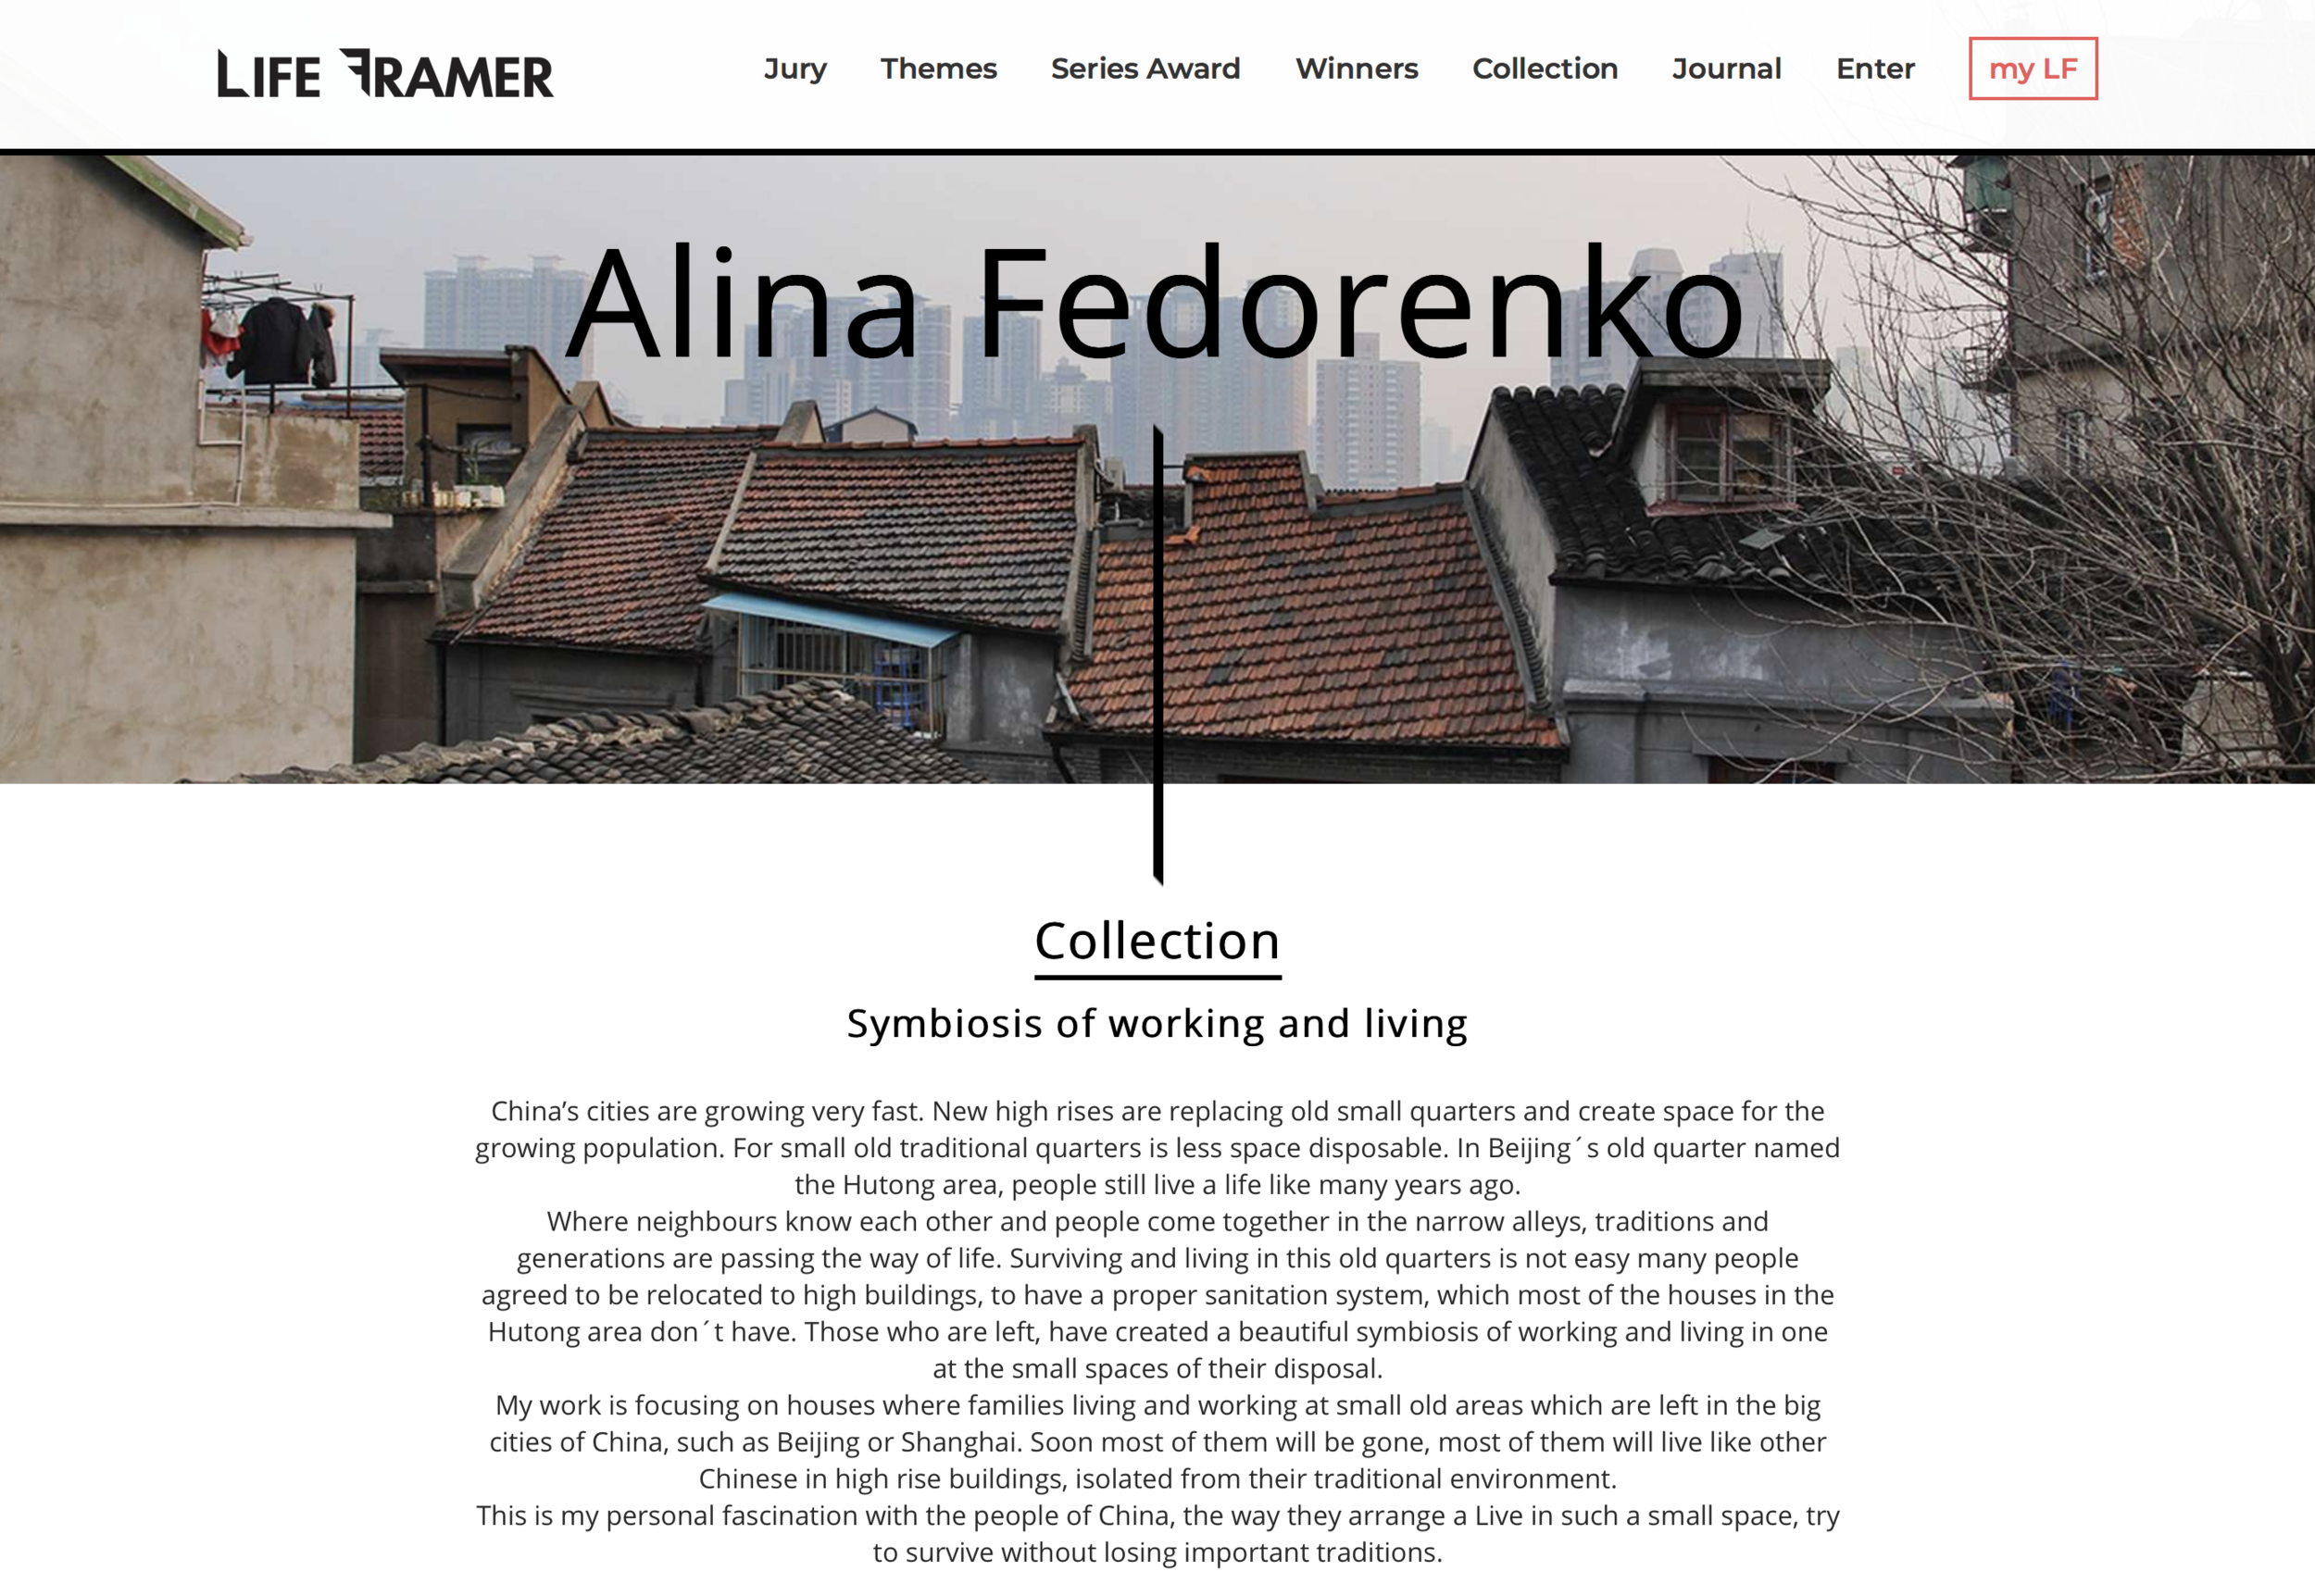 Life Framer Alina Fedorenko.png